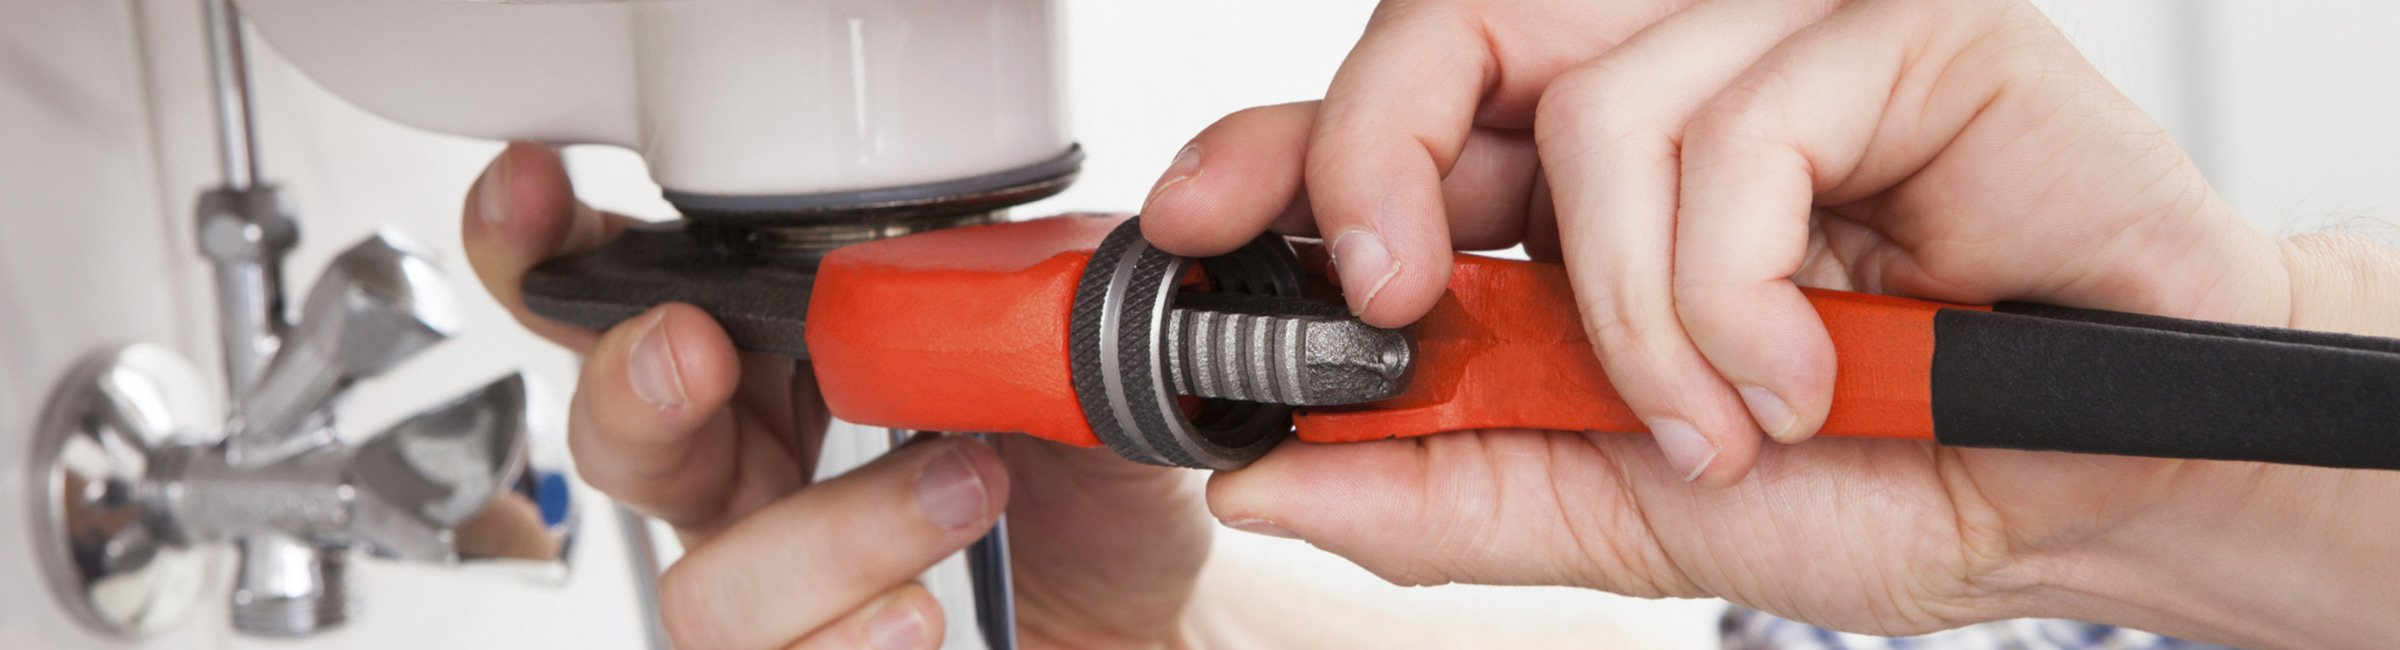 croydon plumbing and hot water plumber fixing a water sink